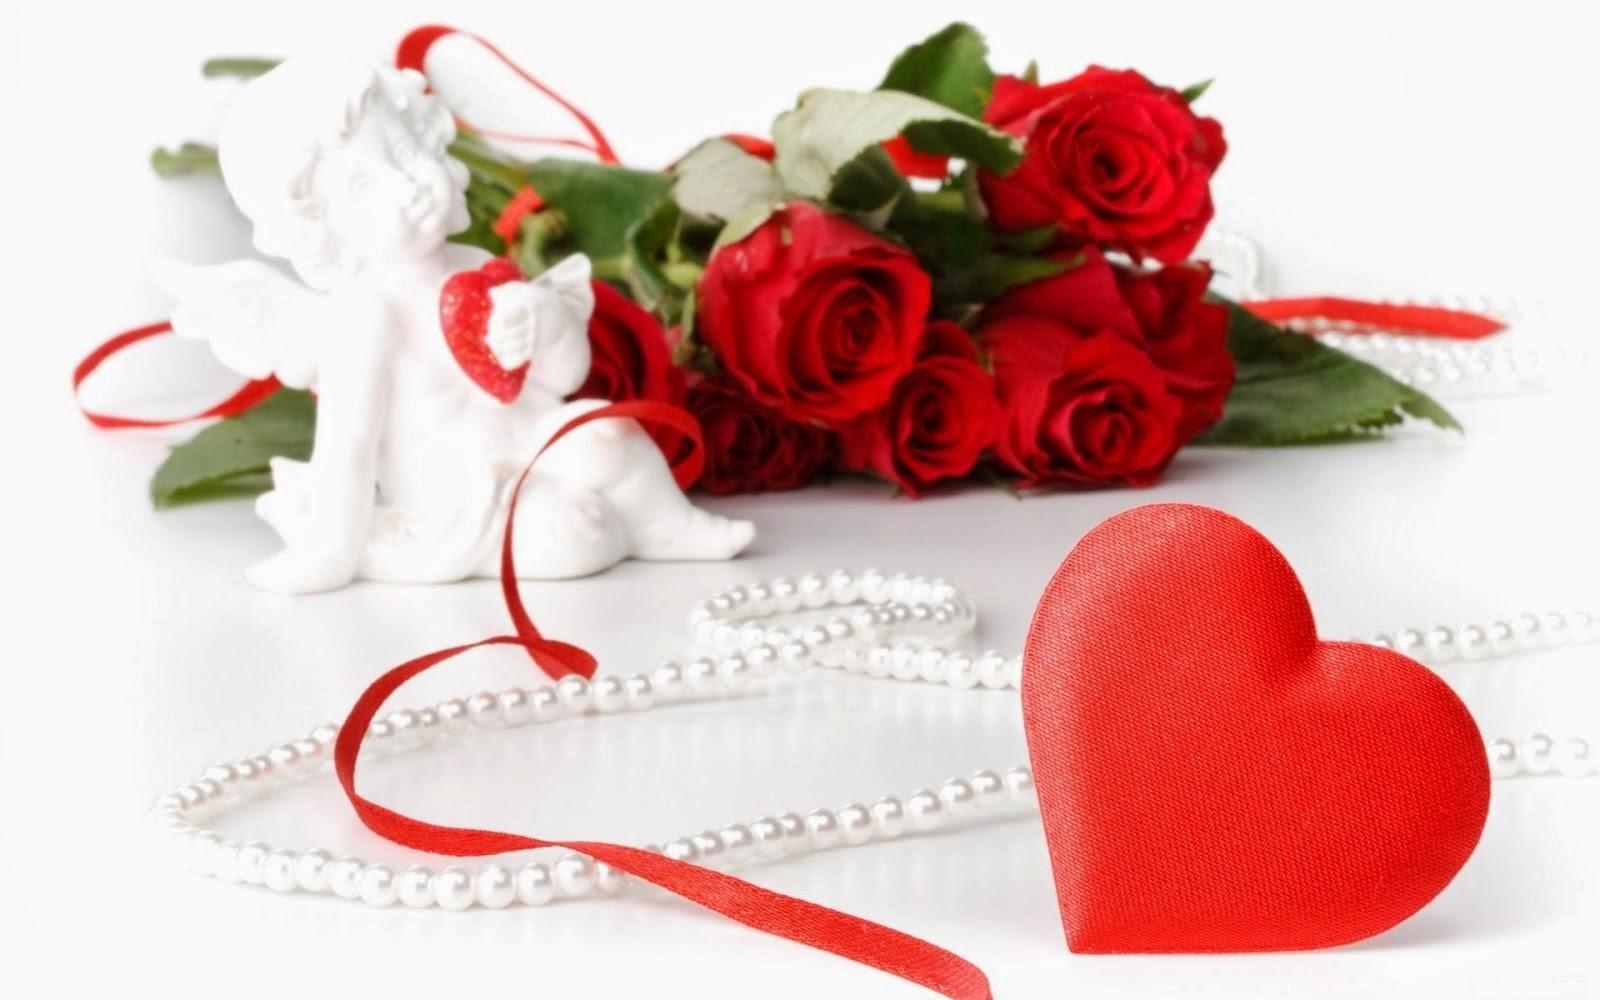 Happy Valentines Day Rose